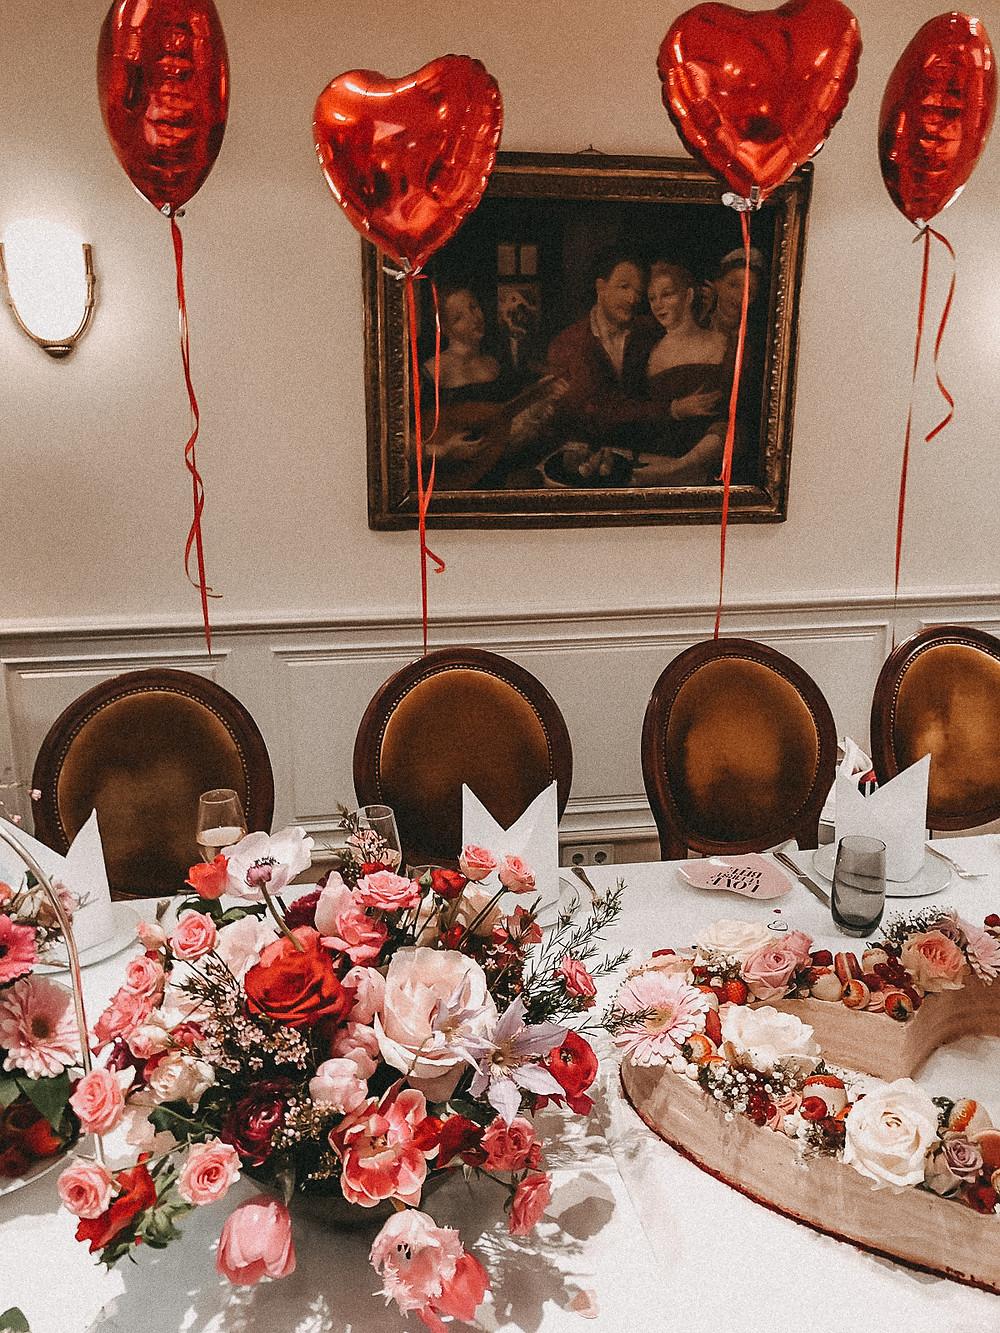 Hunkemöller Valentine's Day Shooting